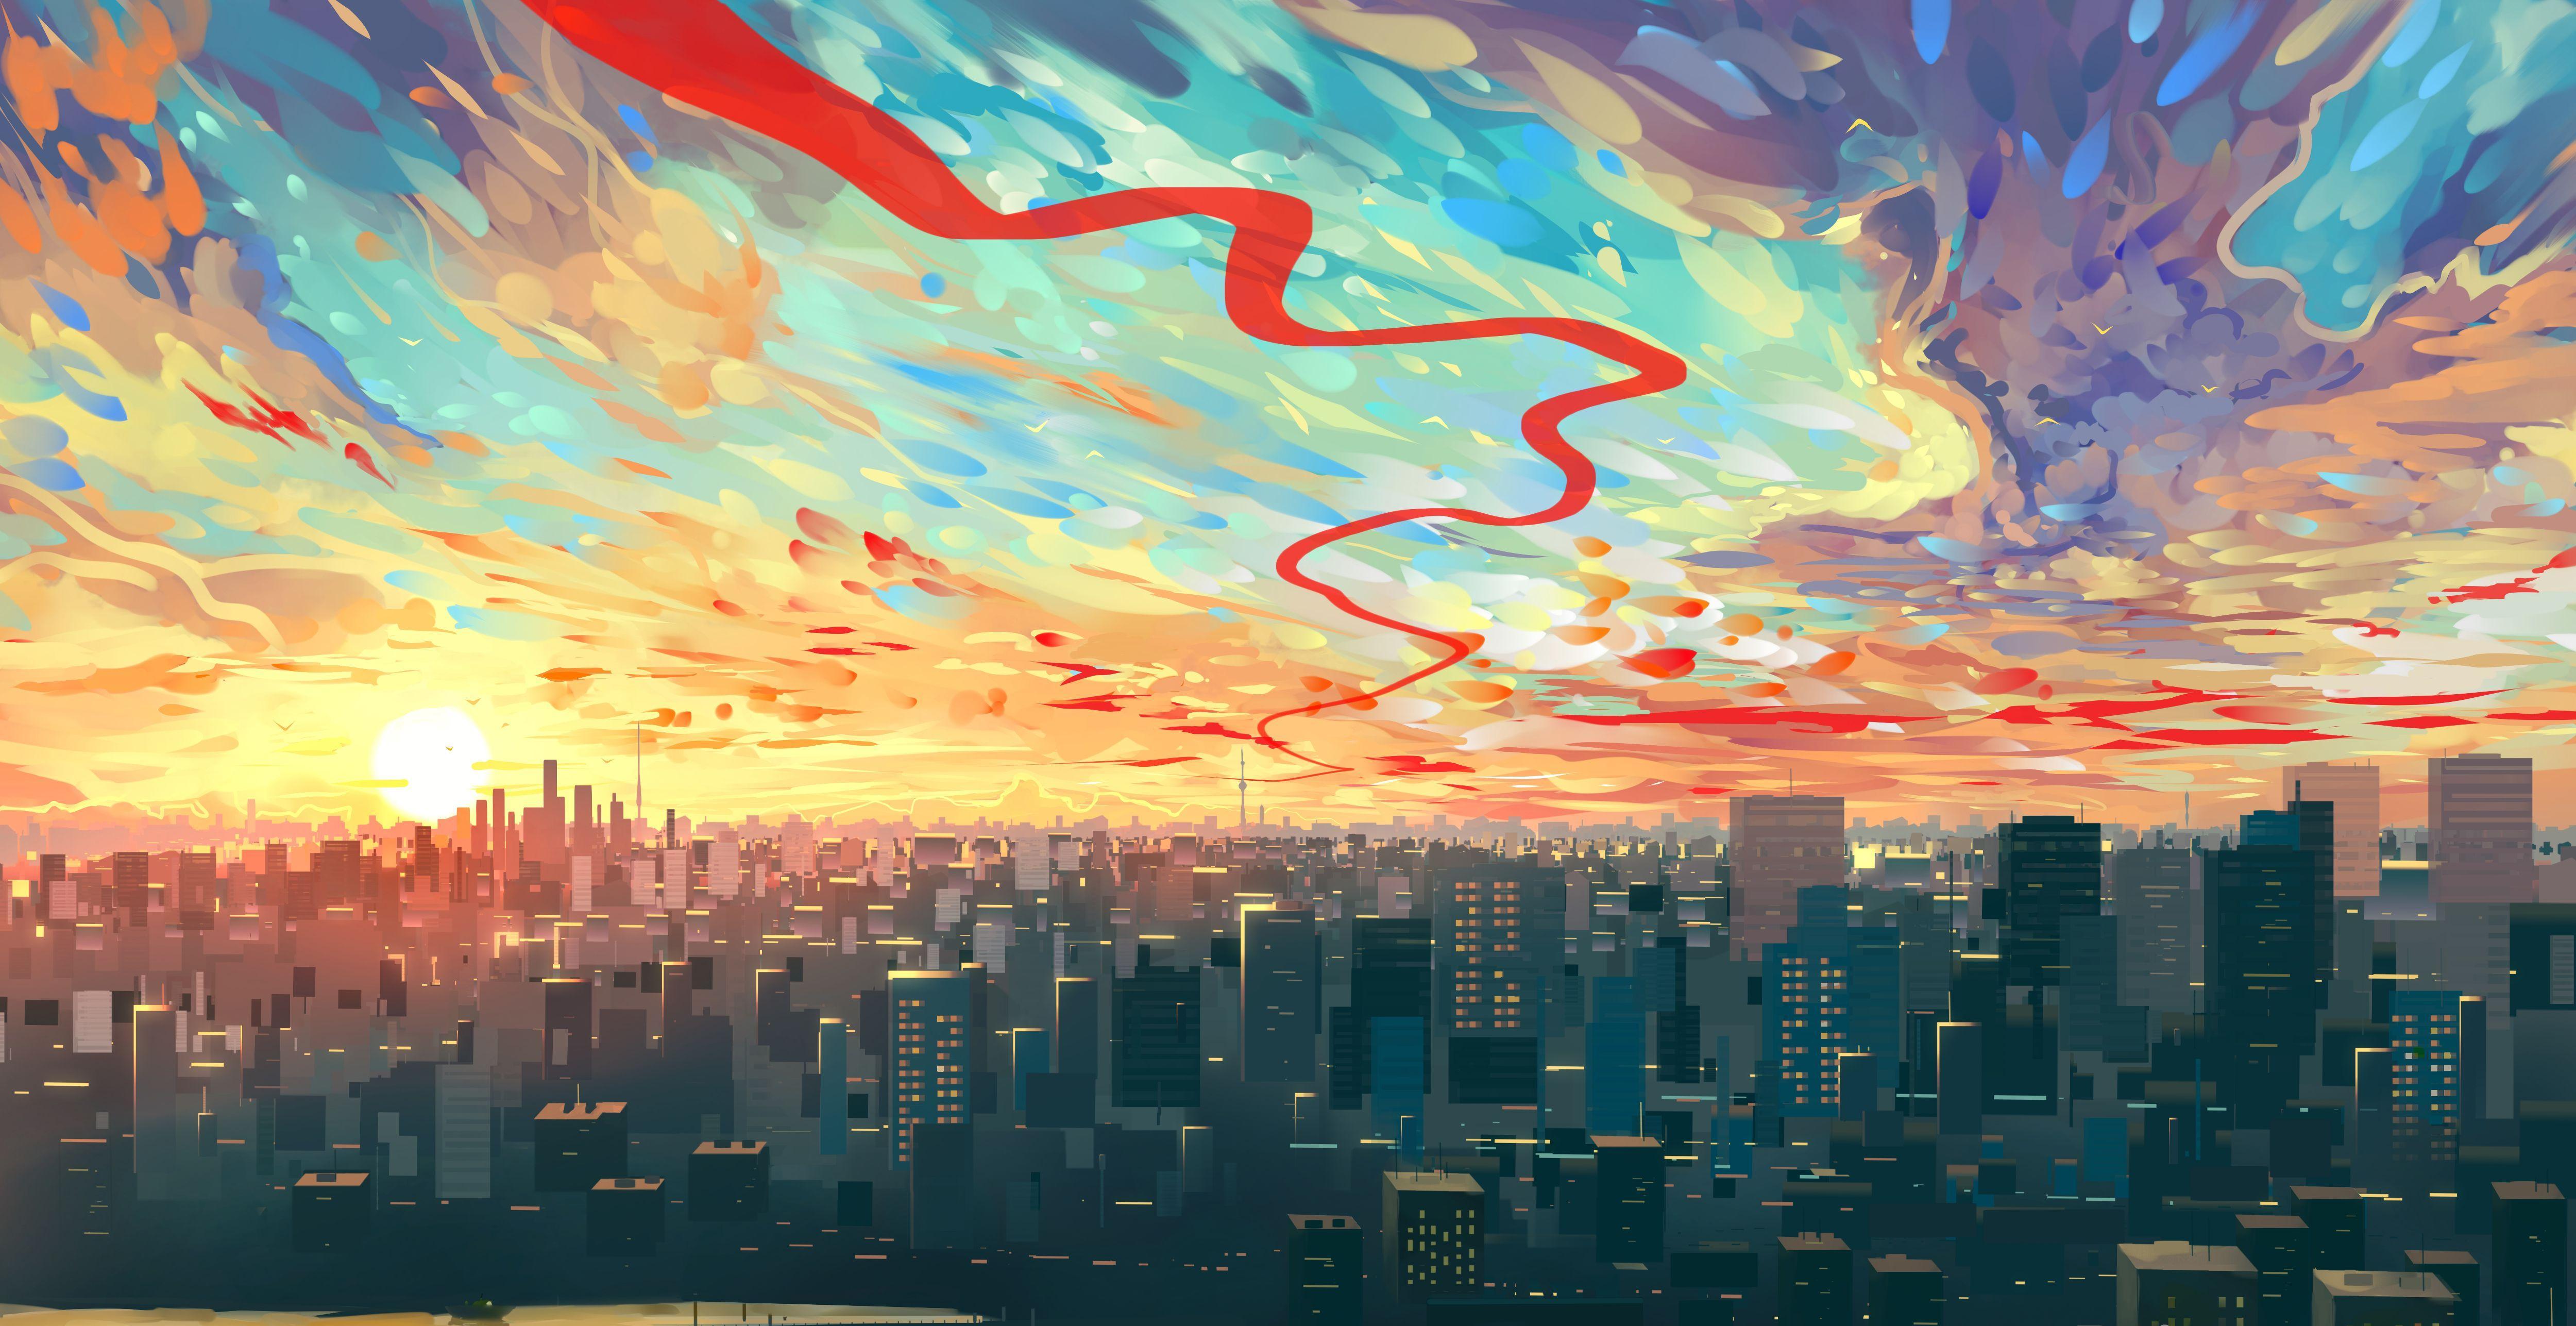 City Art Wallpapers   Top Free City Art Backgrounds   WallpaperAccess